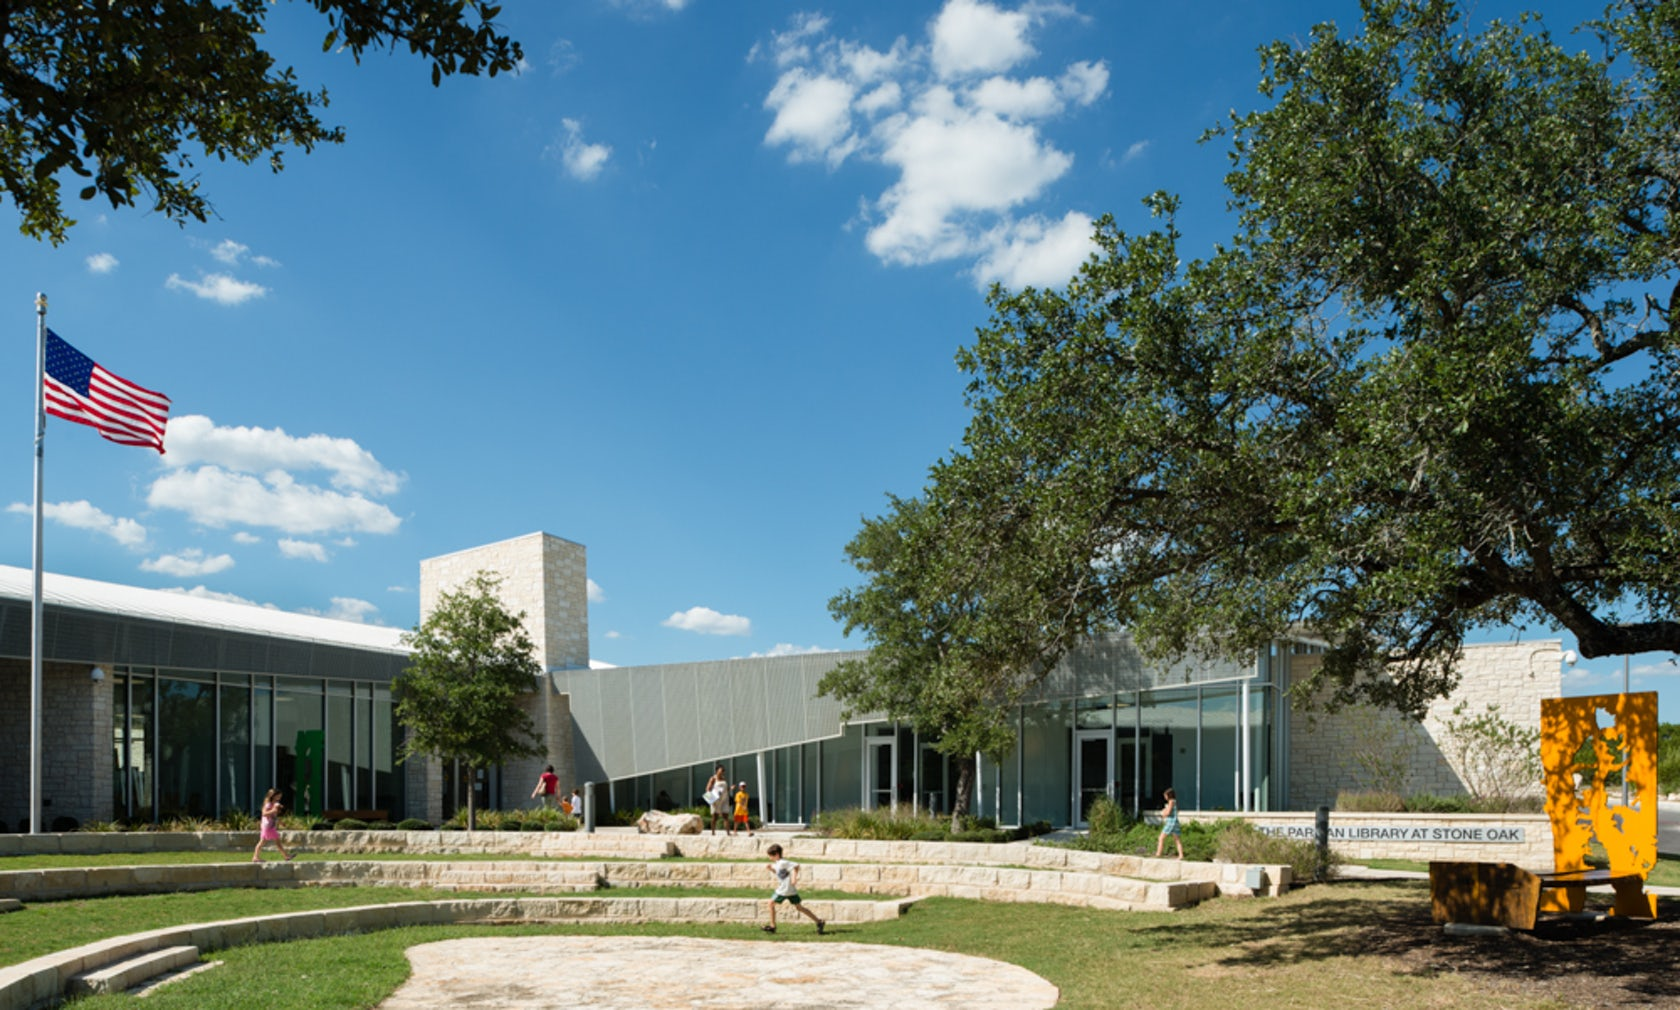 Stone Oak Elevation : Parman library at stone oak architizer